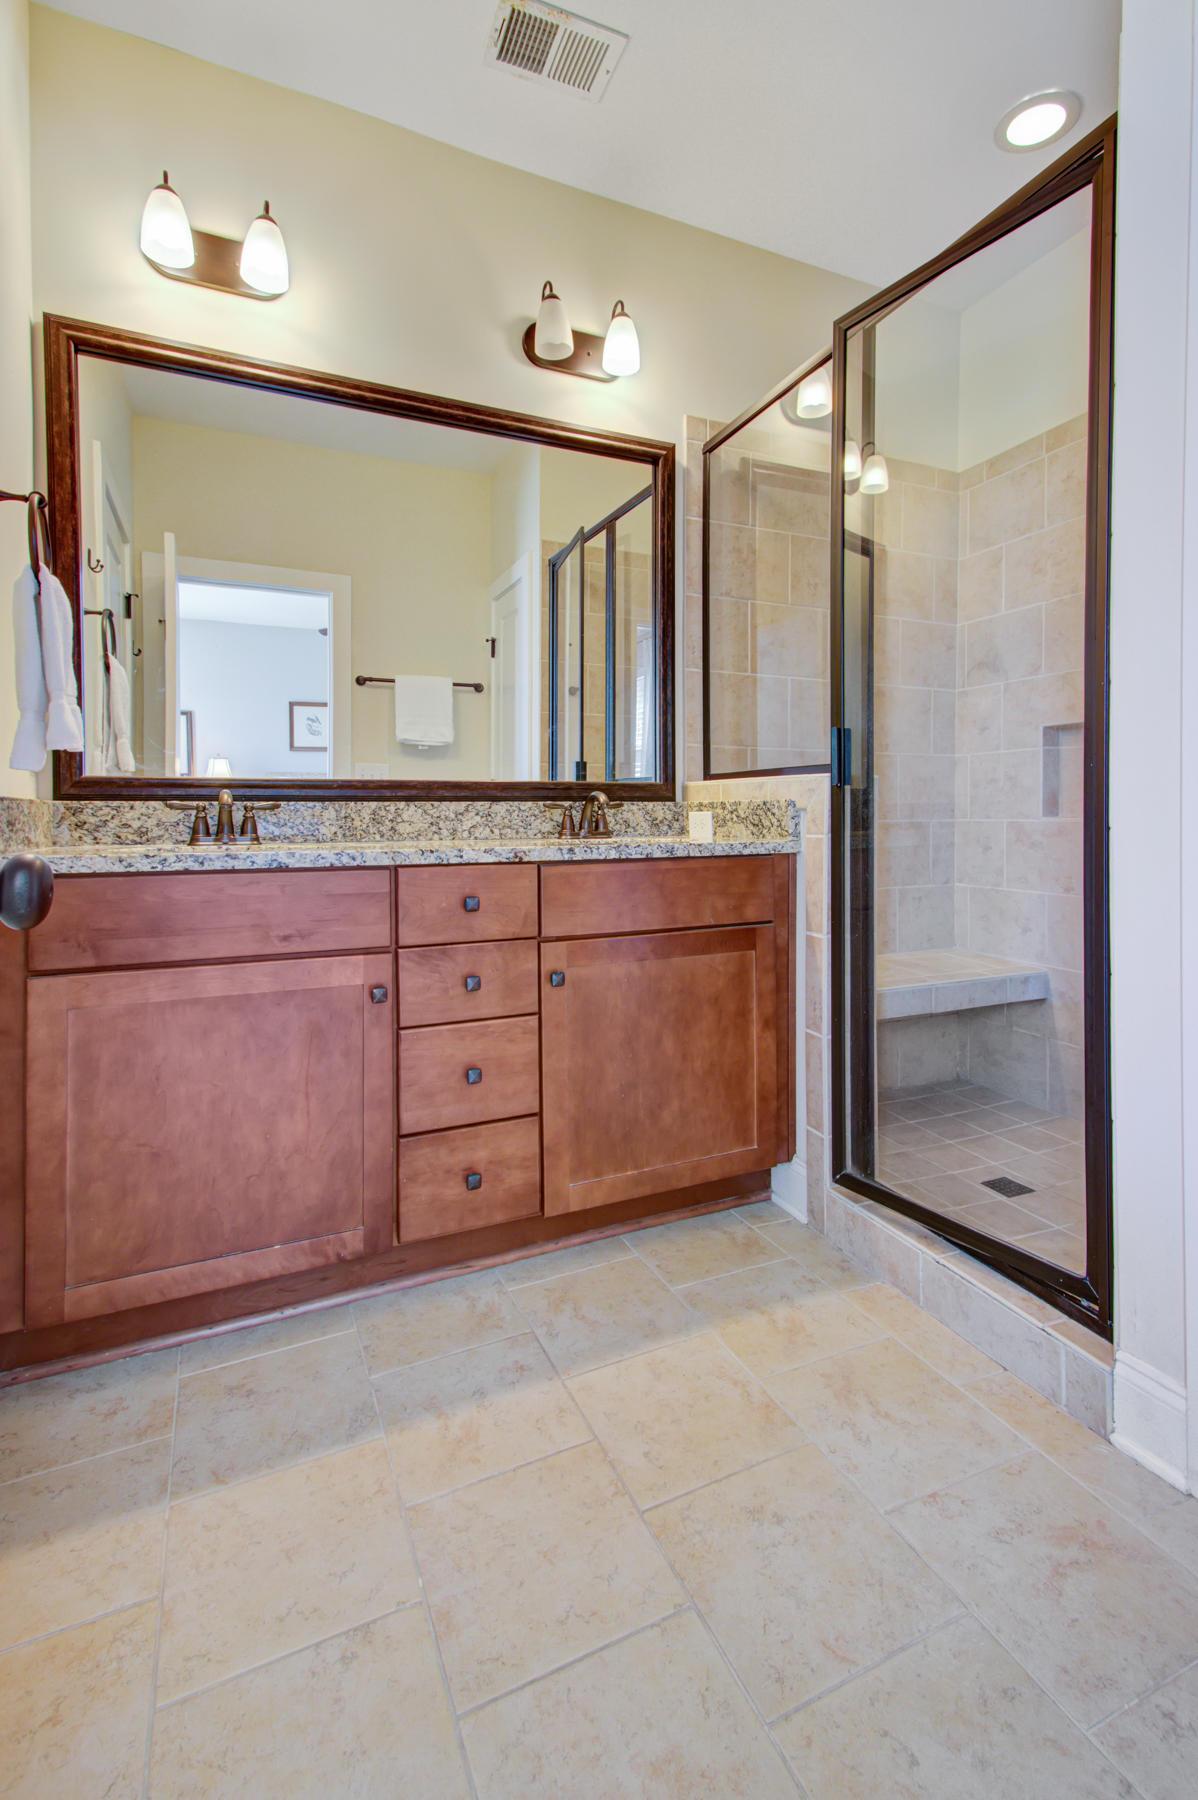 Etiwan Pointe Homes For Sale - 254 Slipper Shell, Mount Pleasant, SC - 7